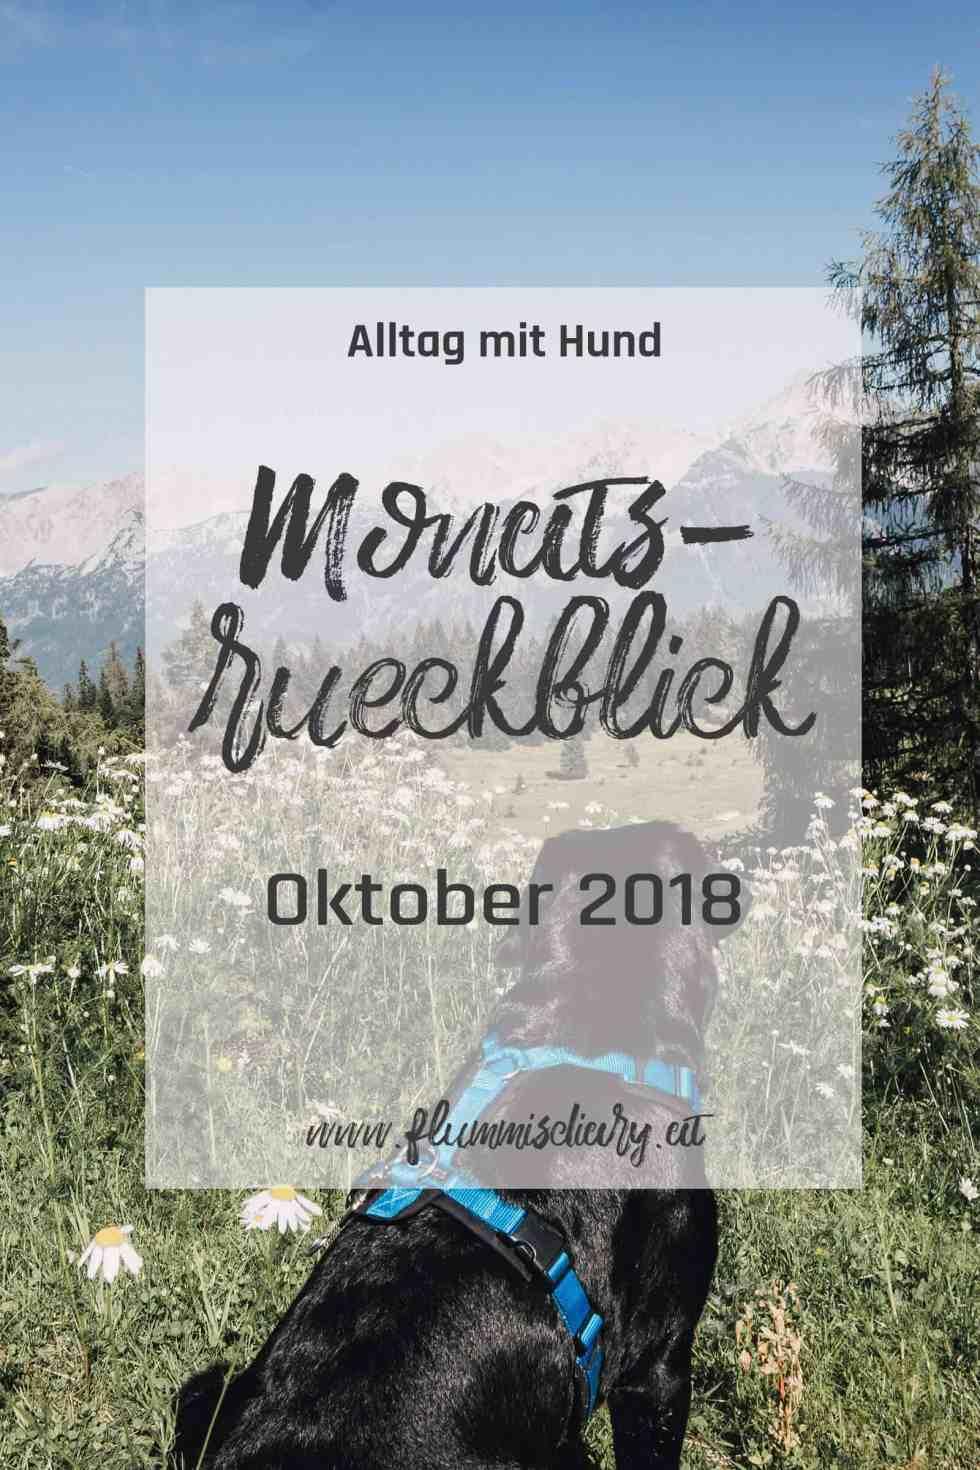 monatsrueckblick-oktober-2018monatsrueckblick-oktober-2018